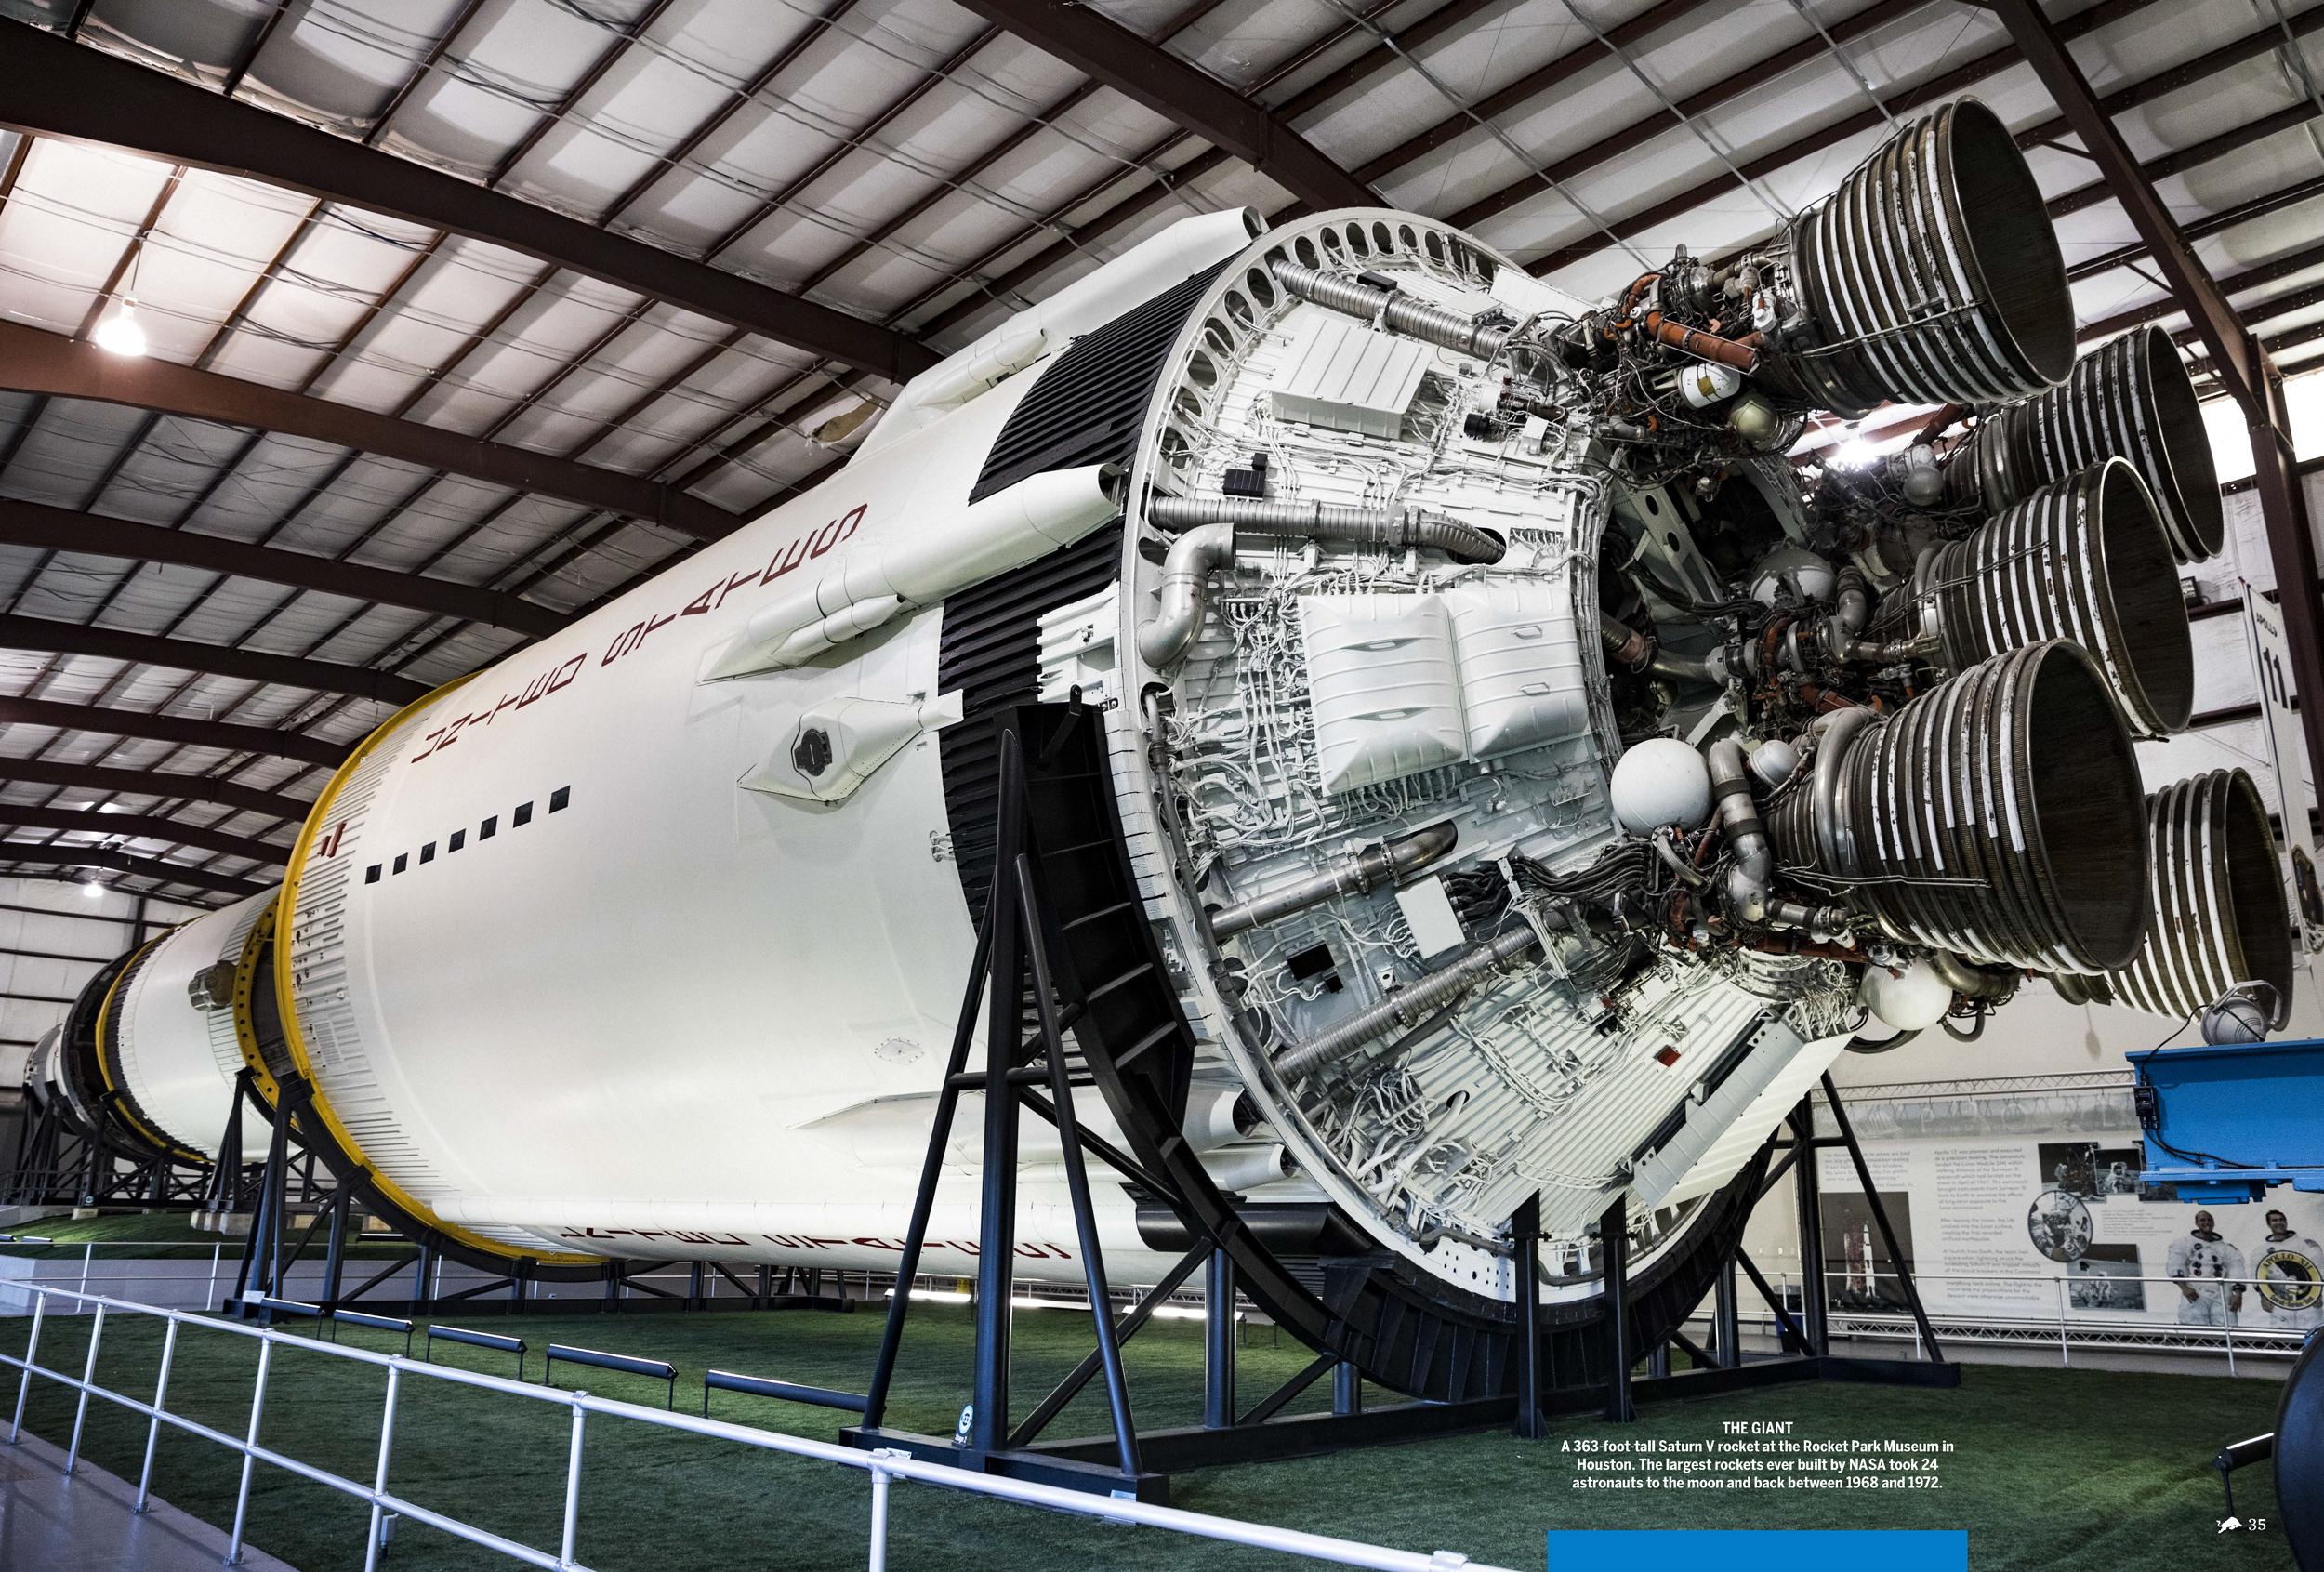 Justin_Bastien_Red_Bulletin_21070601_NASA_Feature_Page_3.jpg